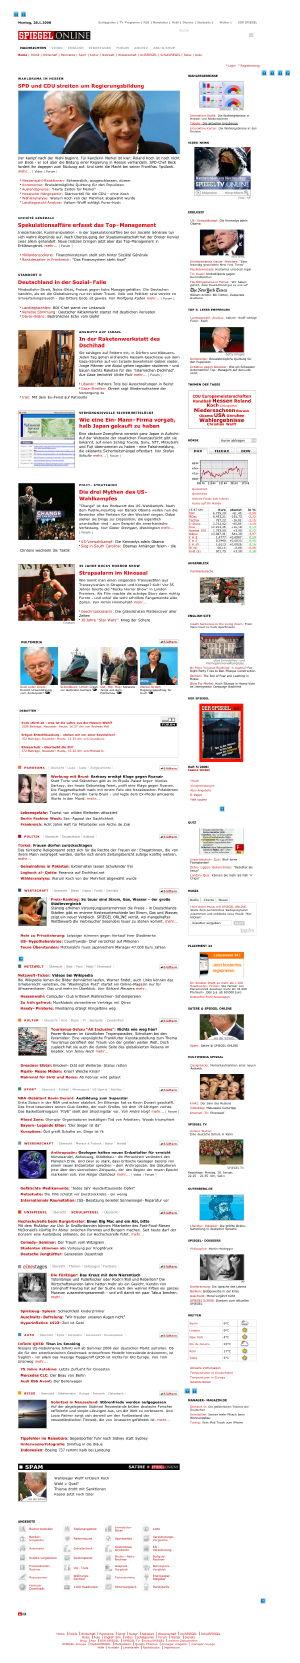 Spiegel Online the way it normally looks